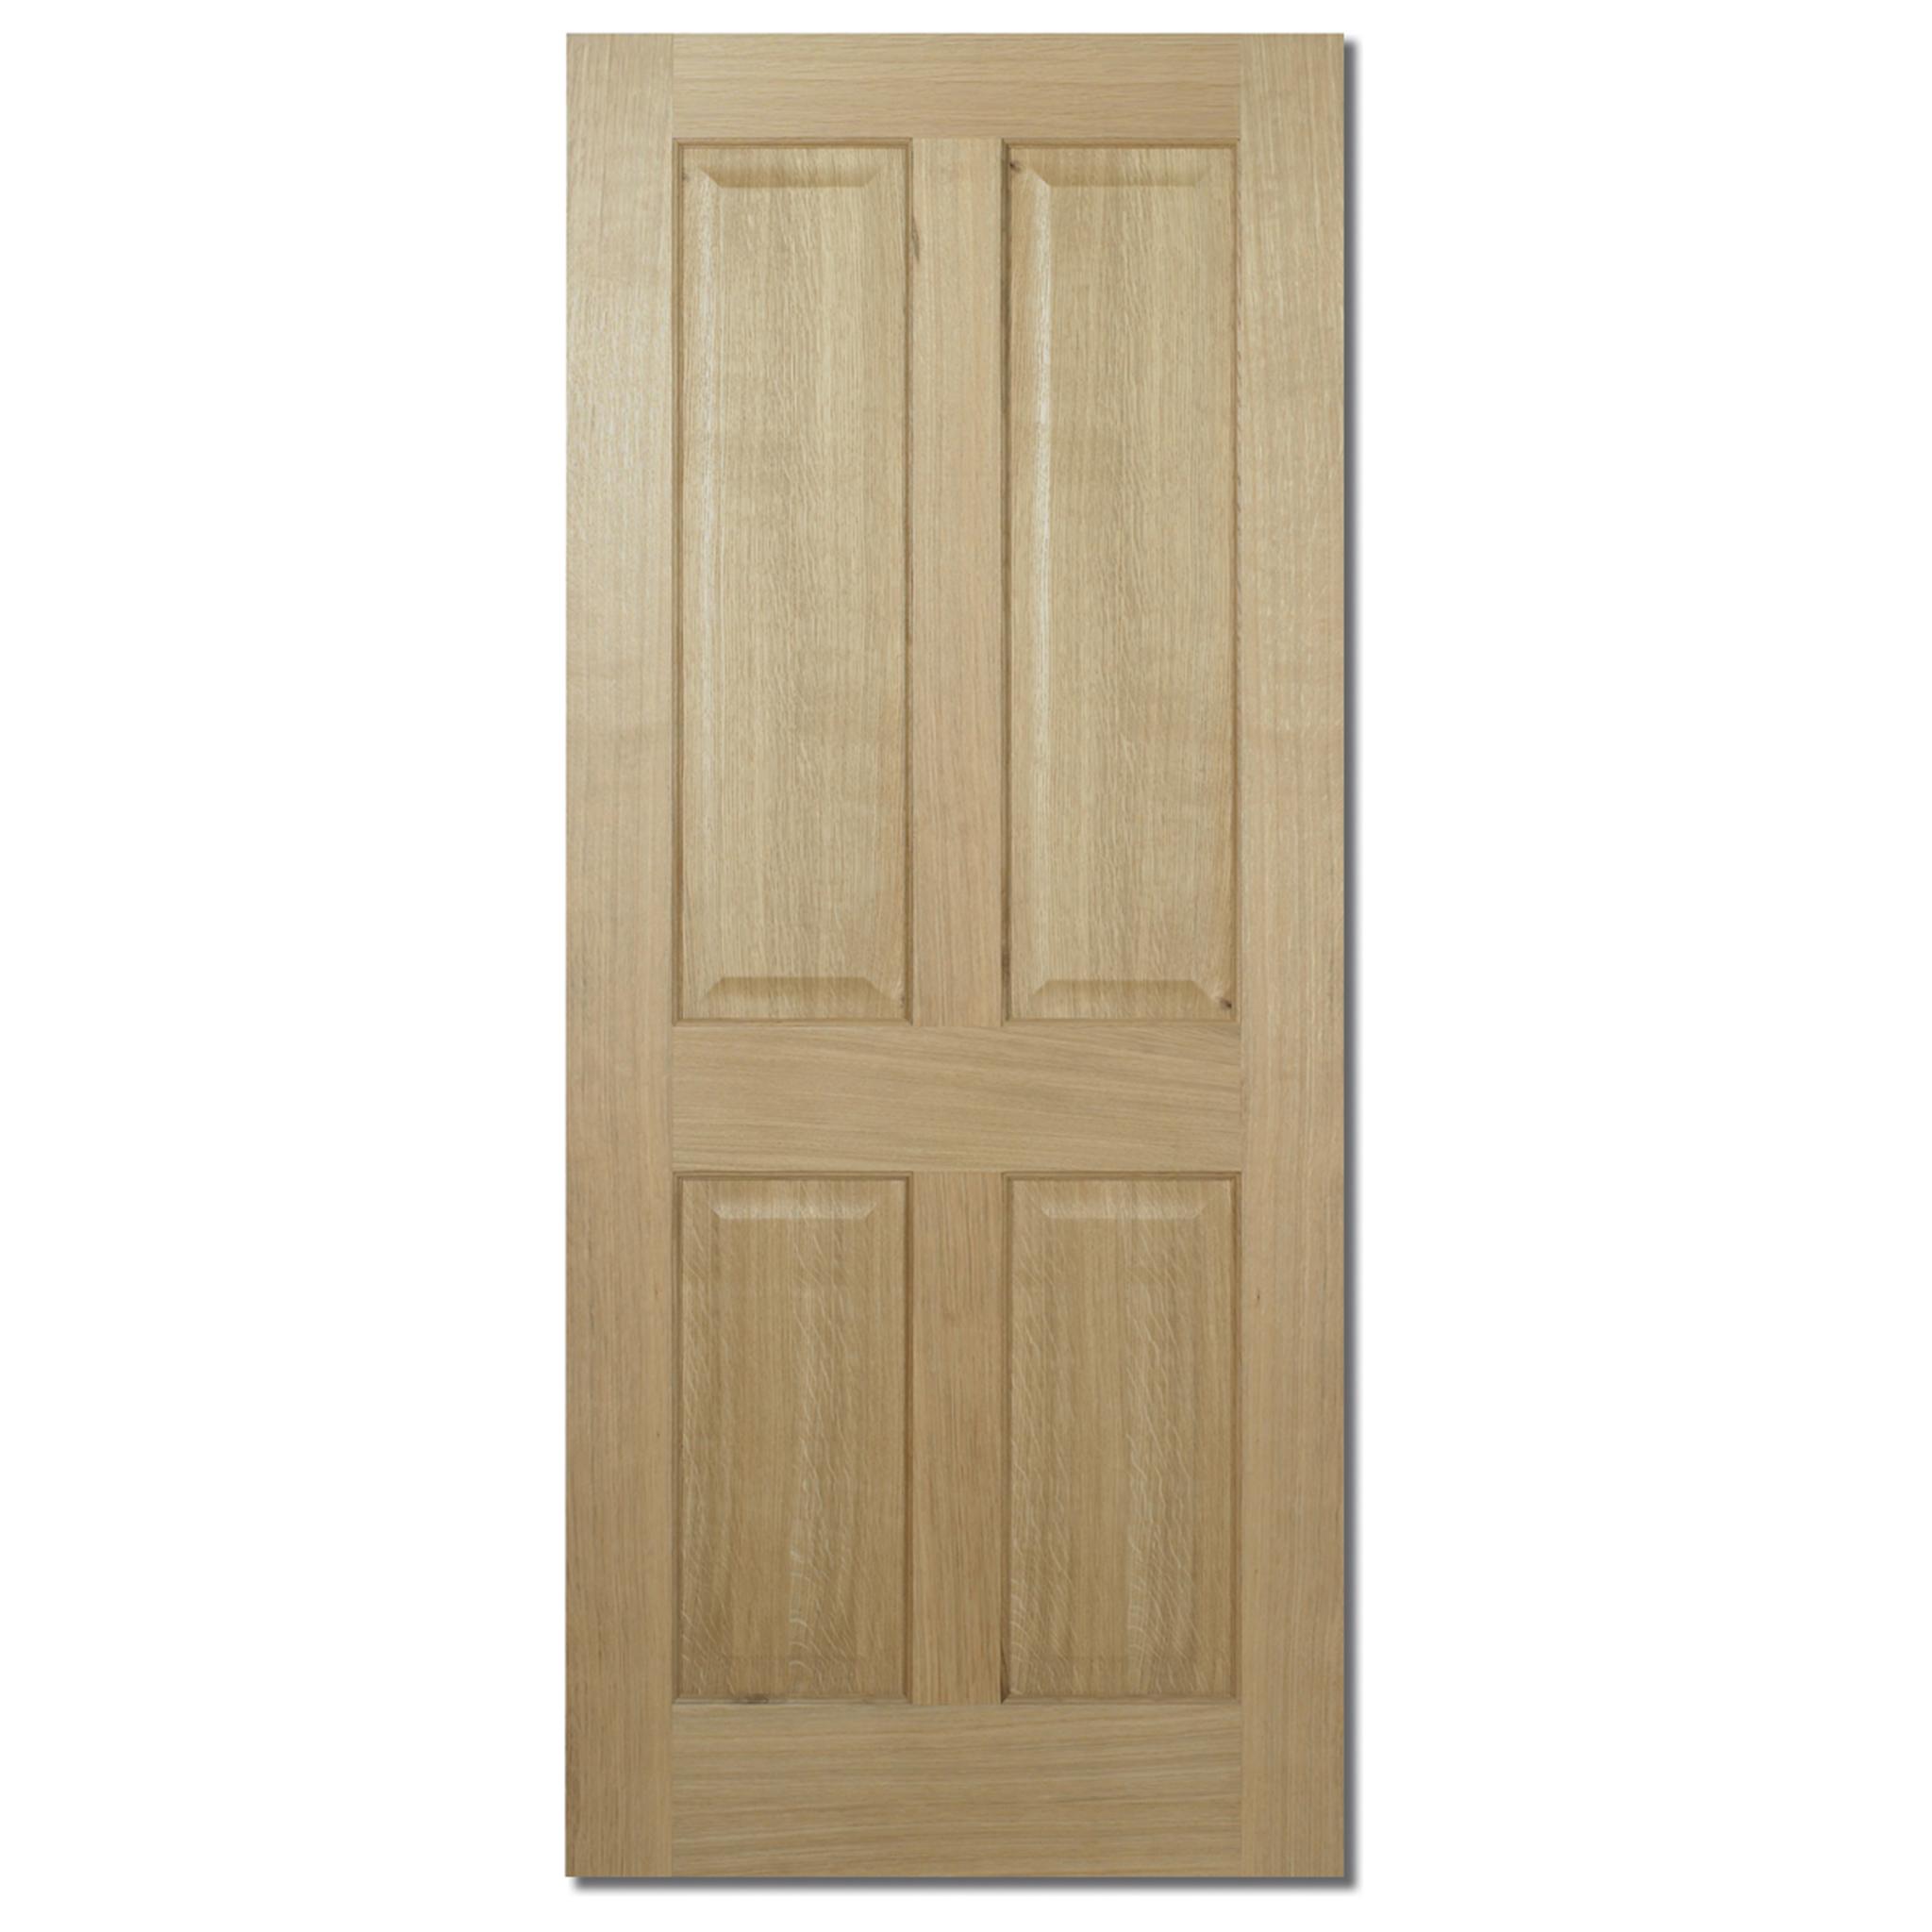 Oak Doors Oak Doors Magnet